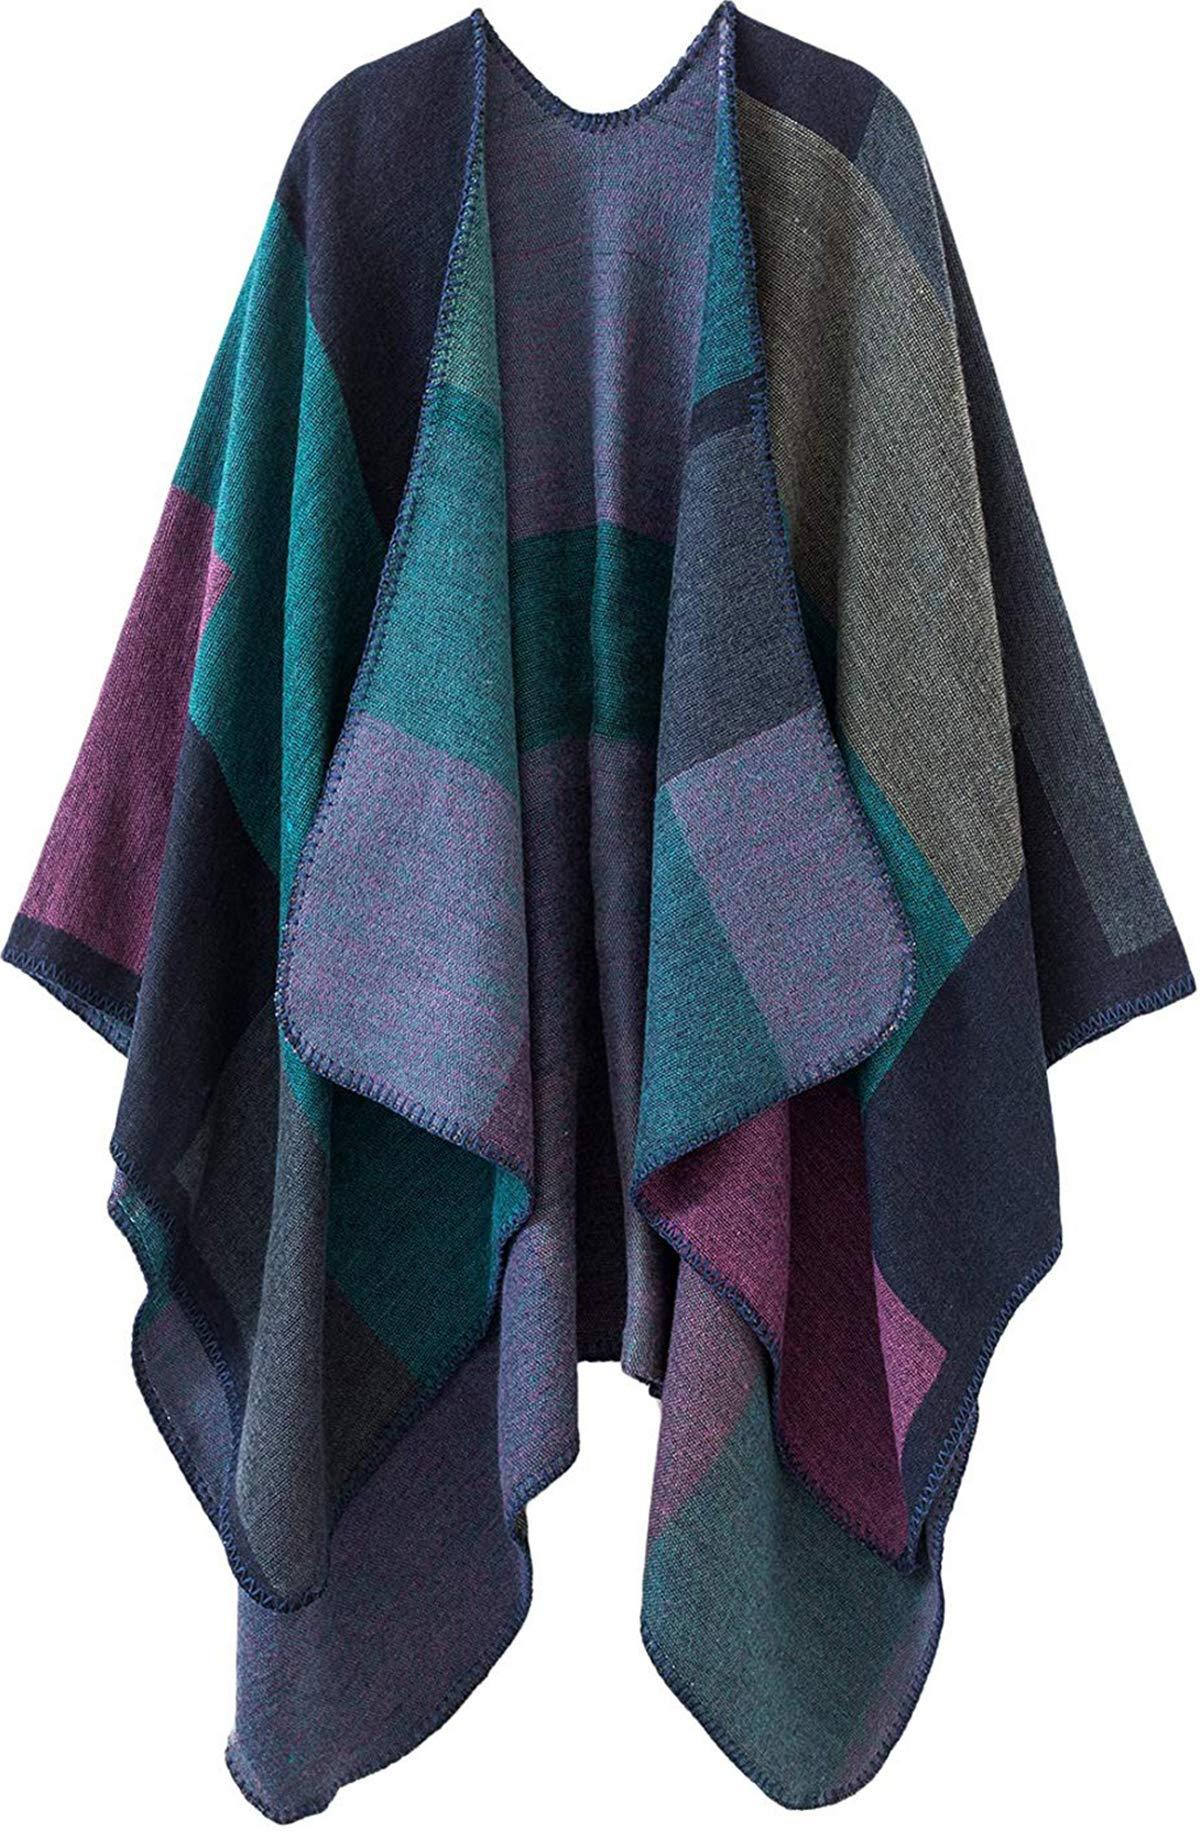 Women Plaid Shawls and Wraps,Winter Poncho Cape,Soft Cashmere Cloak,Oversized Long Cardigan Sweaters(Purple)